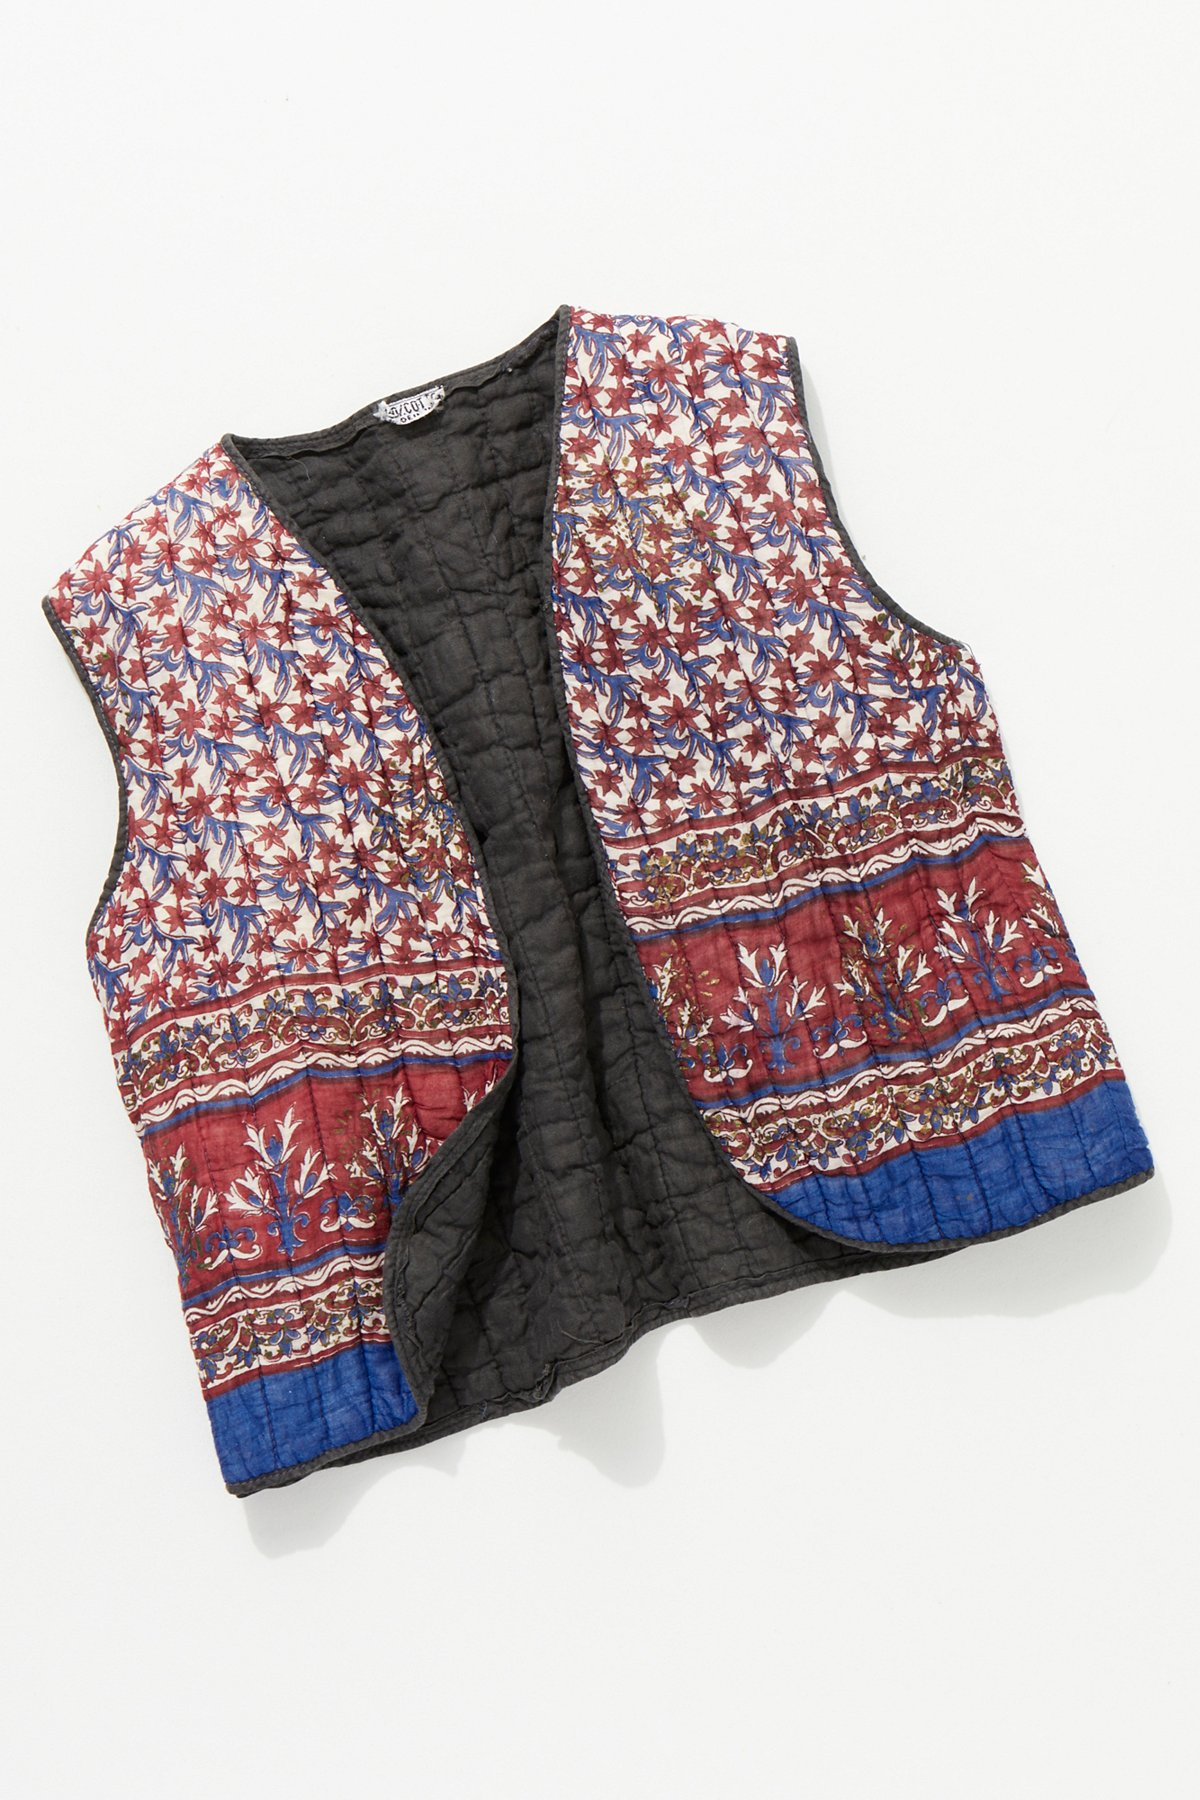 Vintage 1960s Quilted Vest